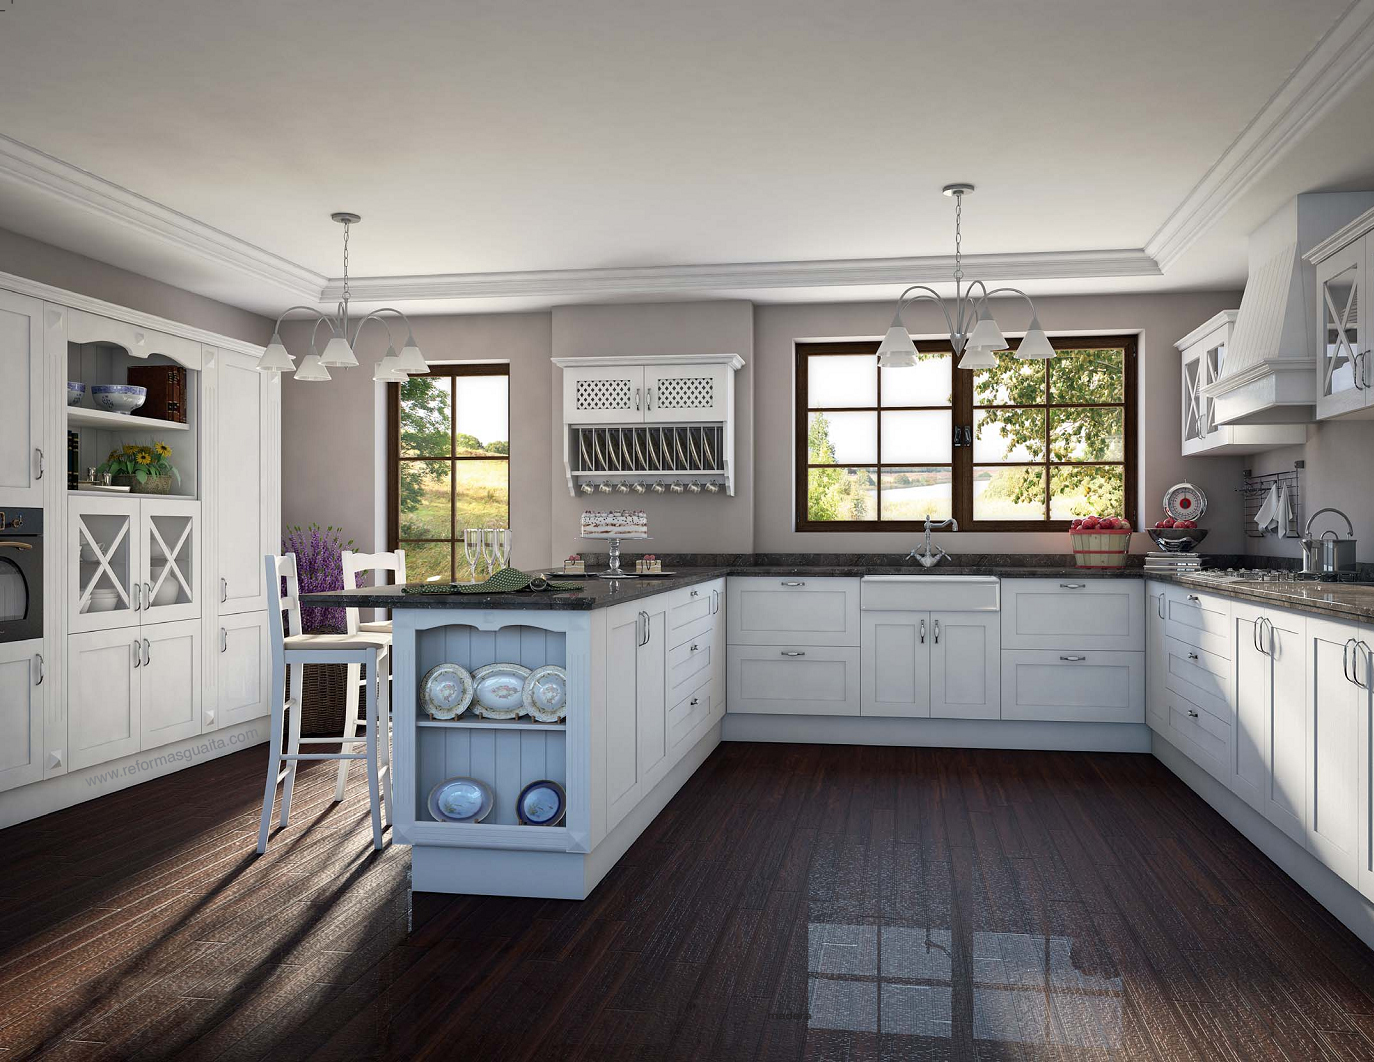 Cocinas Para Casa De Campo - Diseños Arquitectónicos - Mimasku.com